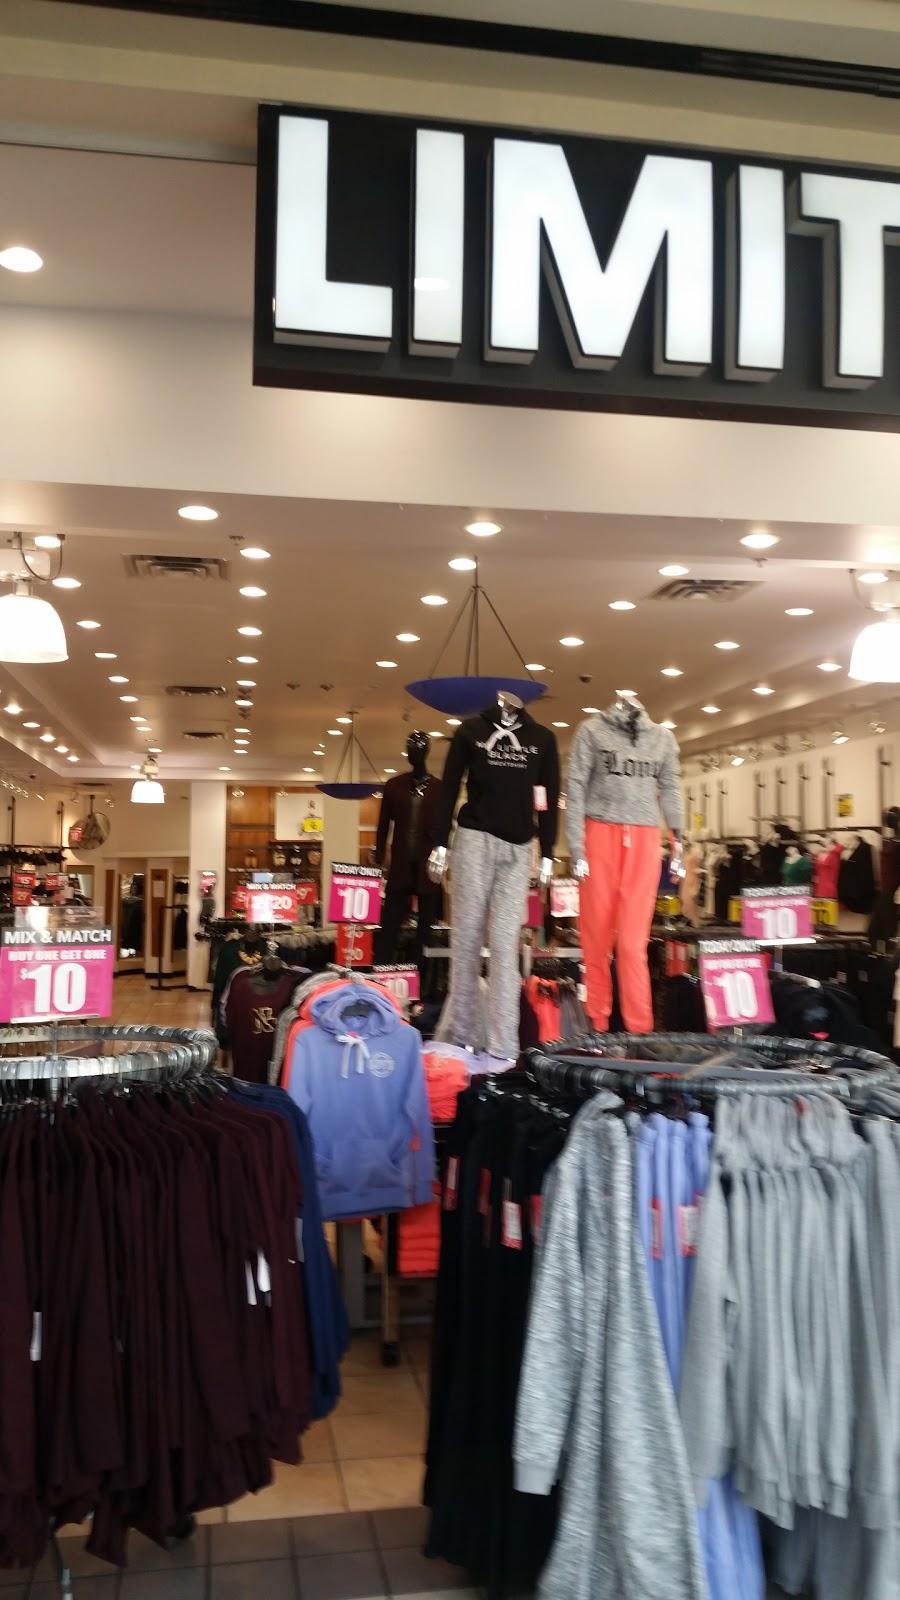 Limite Canada | clothing store | 500 Rexdale Blvd, Etobicoke, ON M9W 6K5, Canada | 4166745585 OR +1 416-674-5585